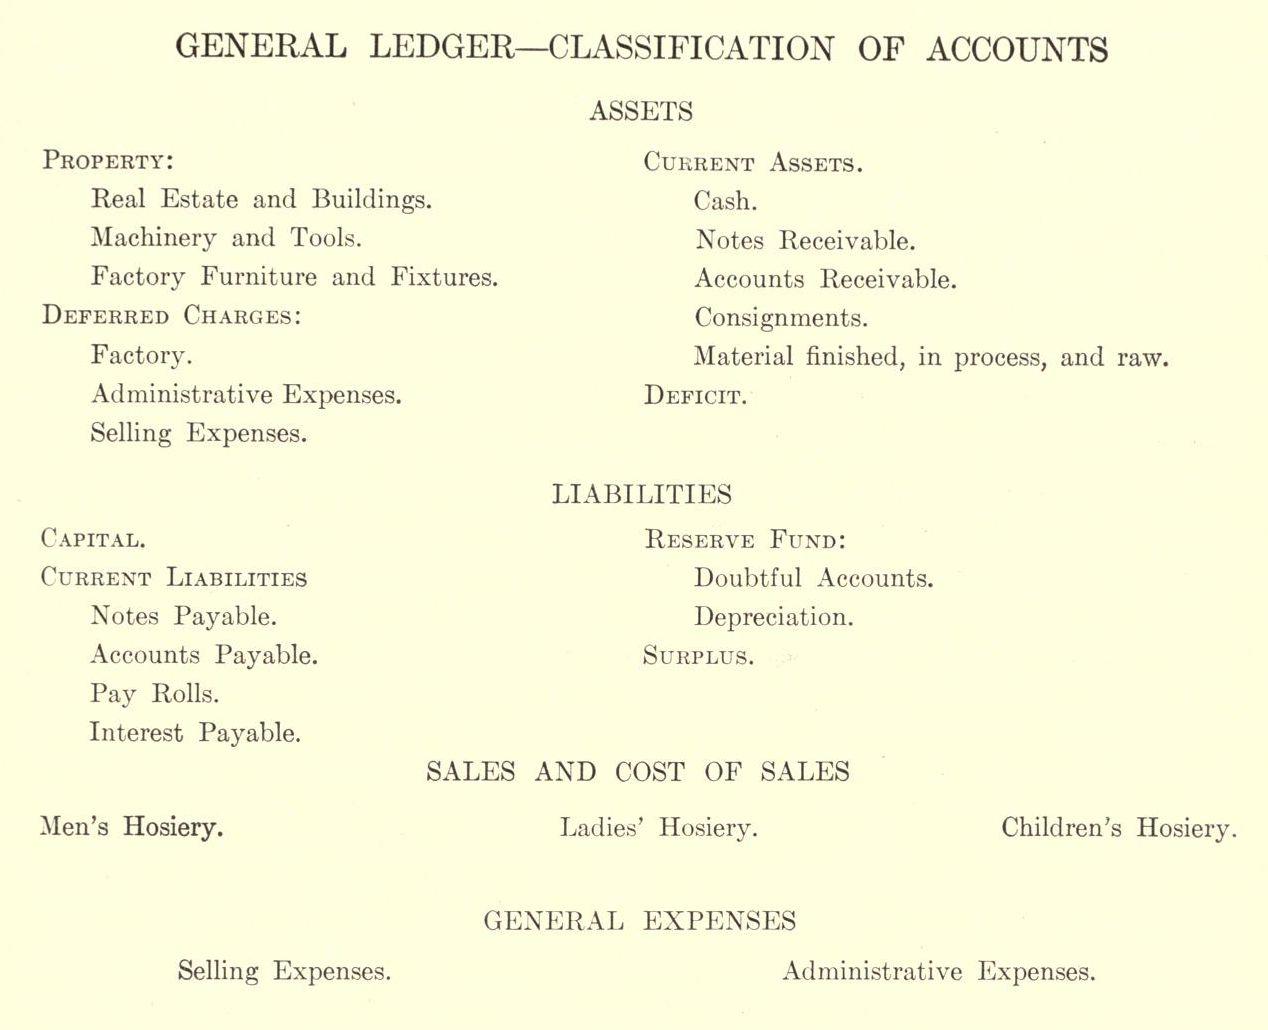 file general ledger classification of accounts 1909 jpg